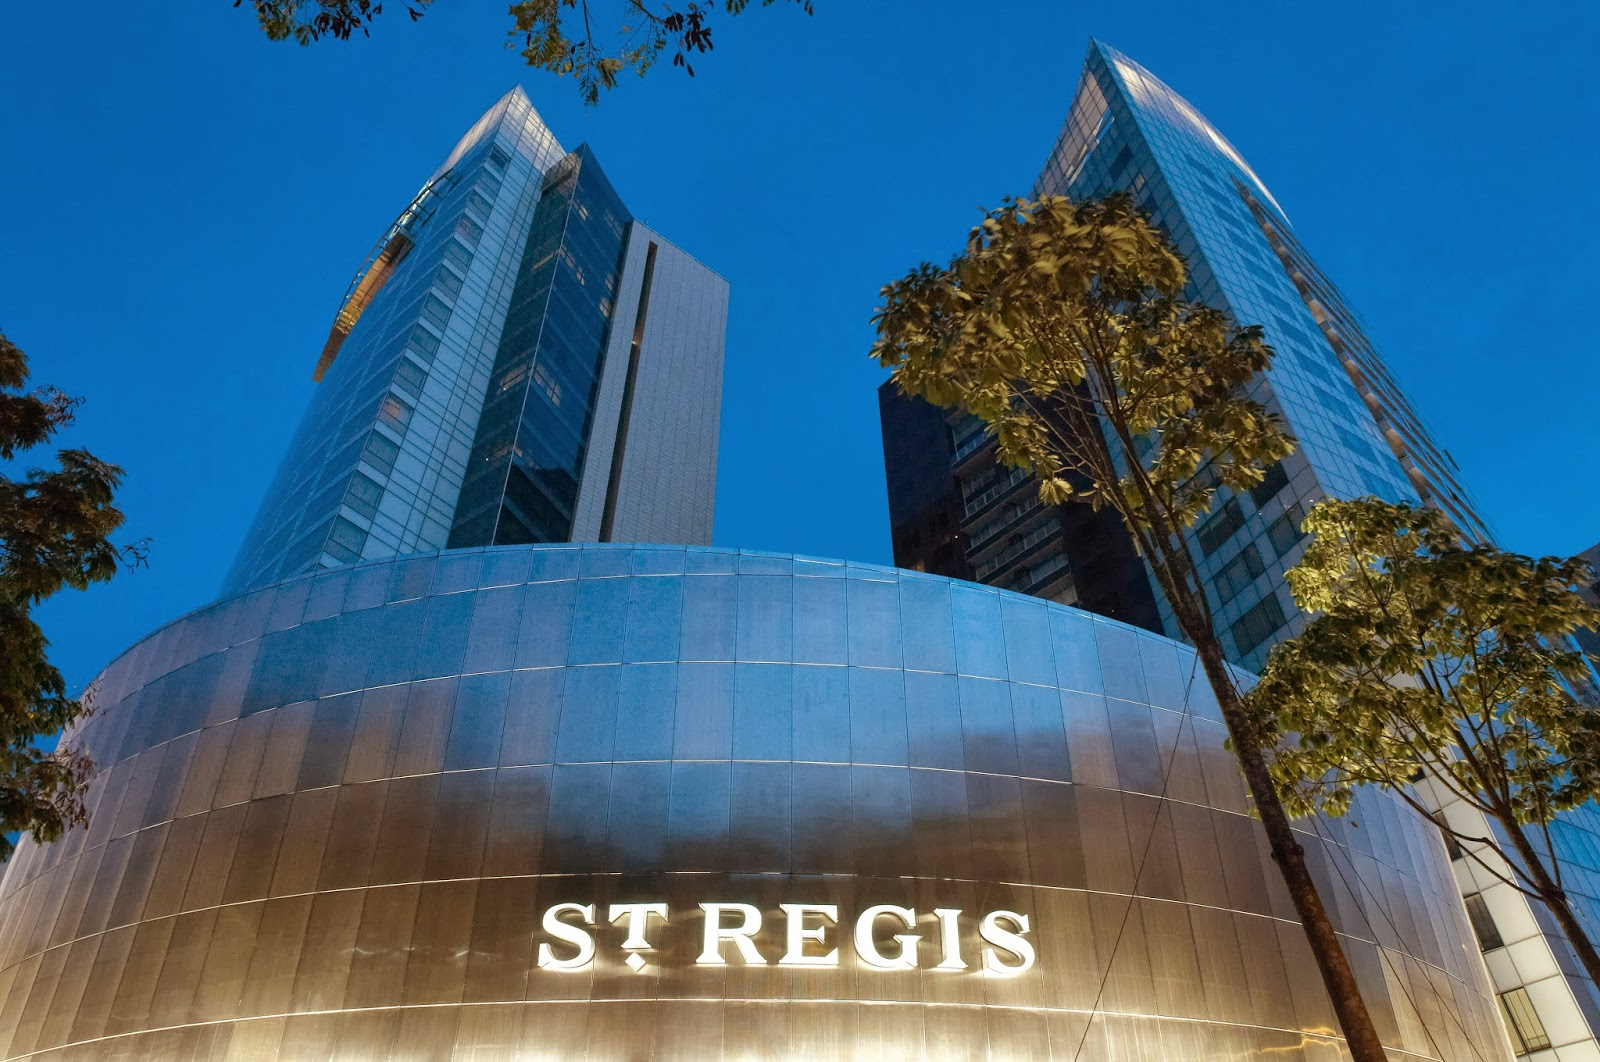 The st regis singapore 4 luxury hotel luxury for The st regis